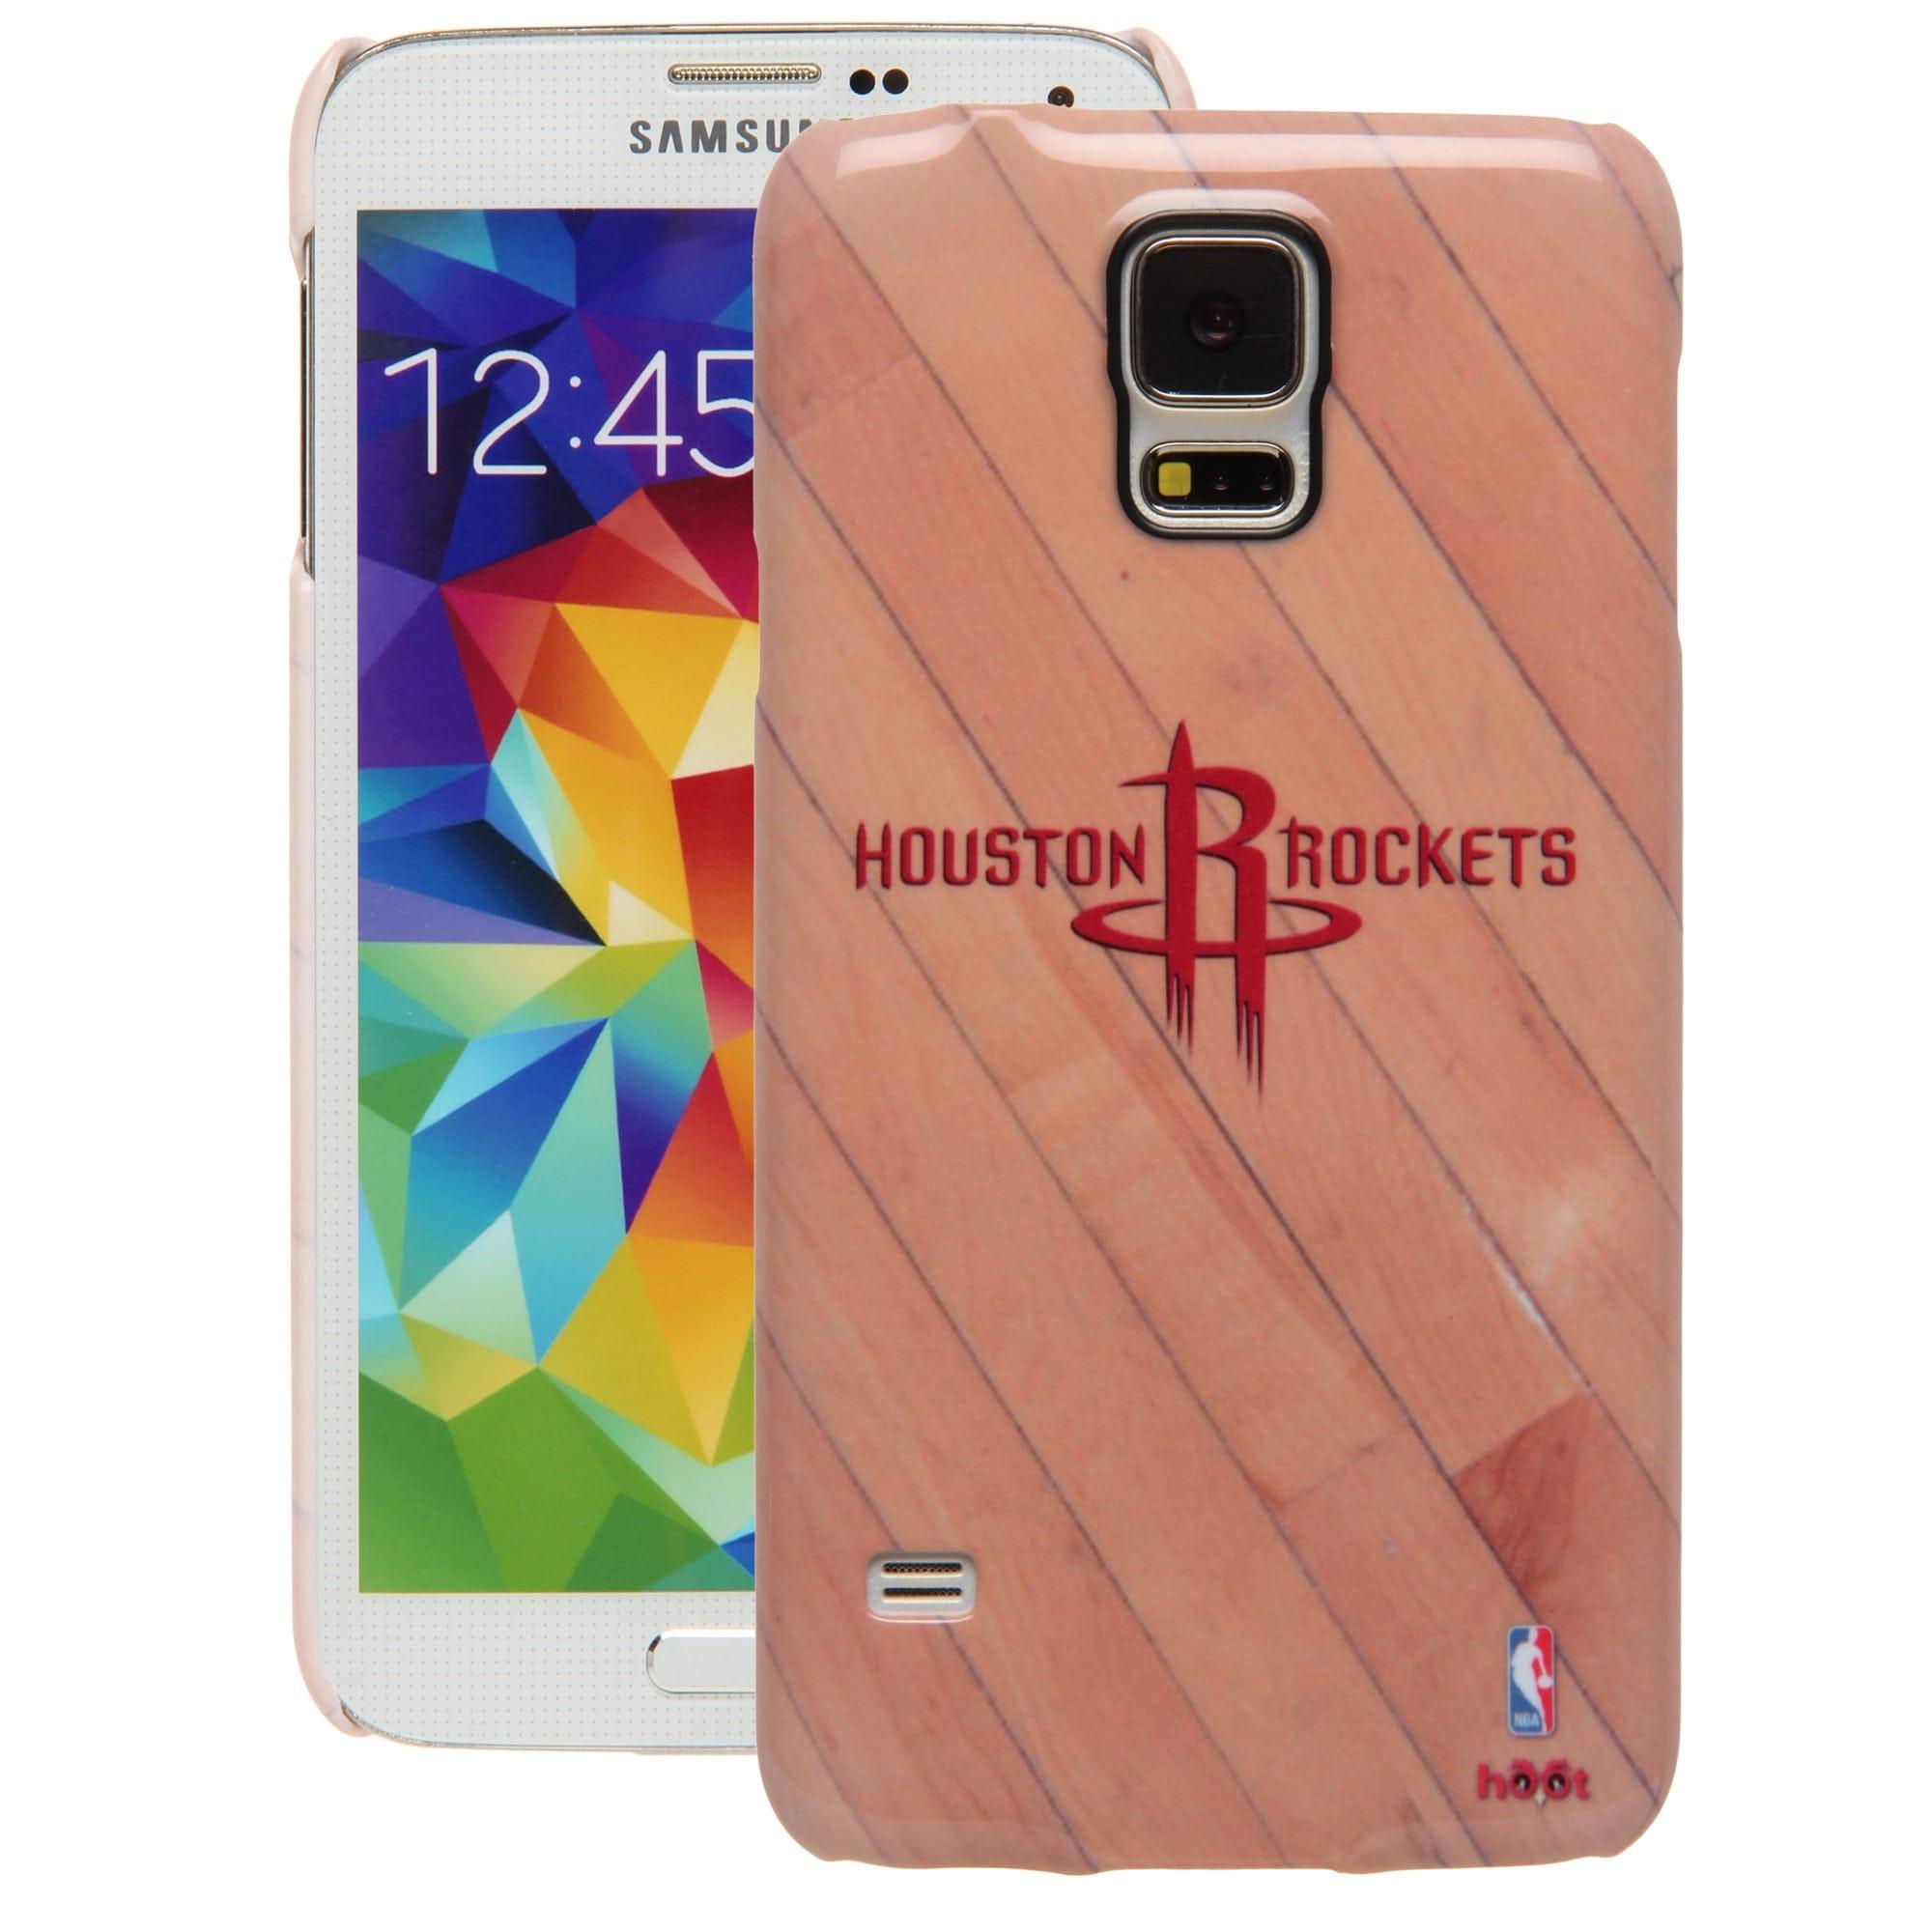 Houston Rockets Galaxy S5 Hardwood Court Case